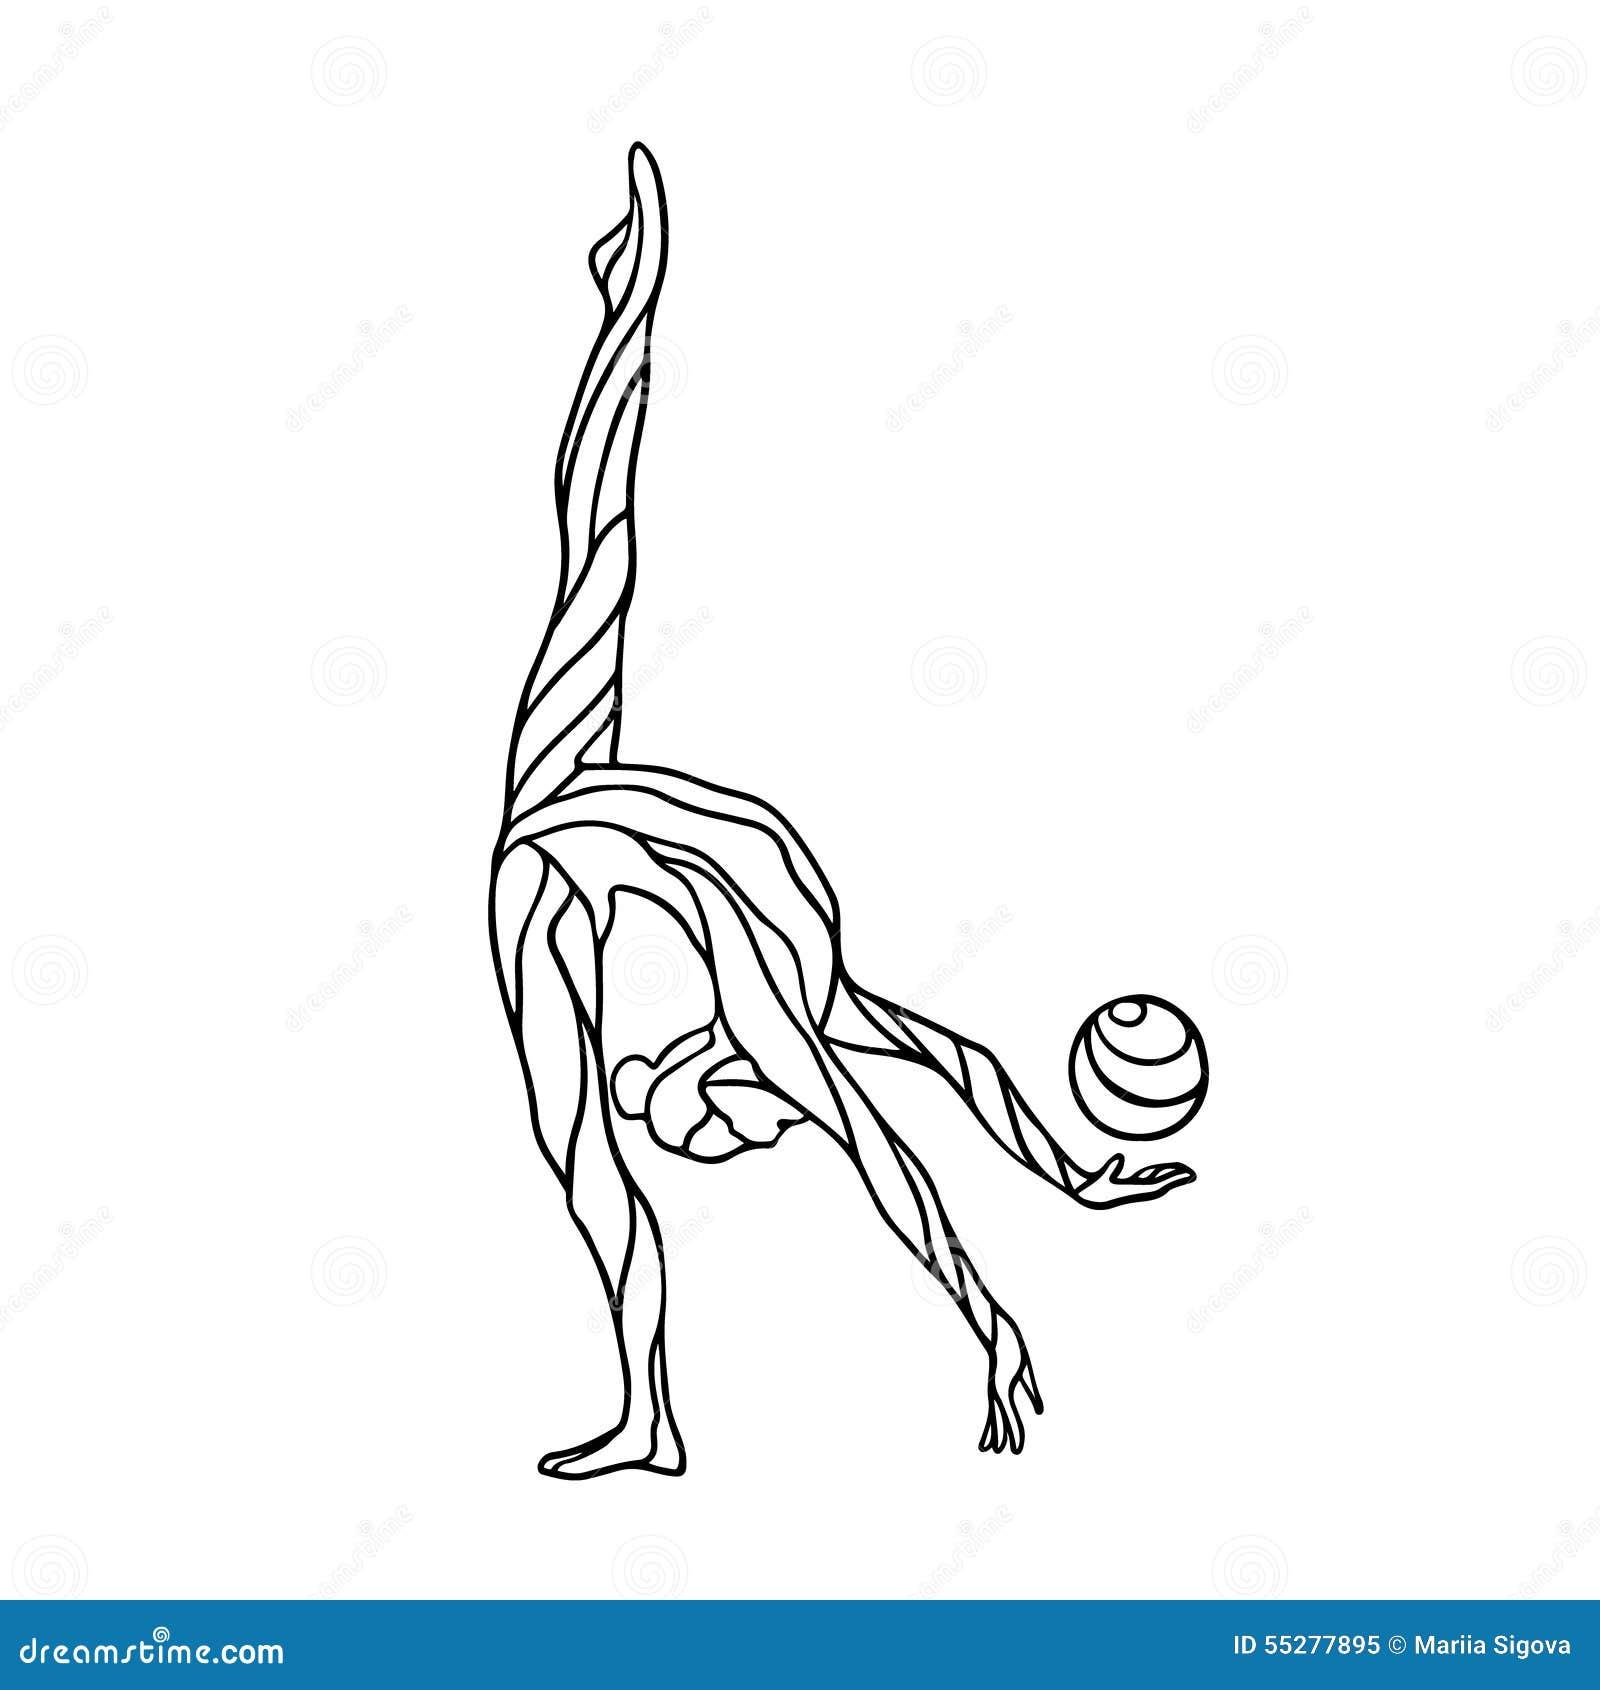 Creative Silhouette Of Gymnastic Girl Art Gymnastics With